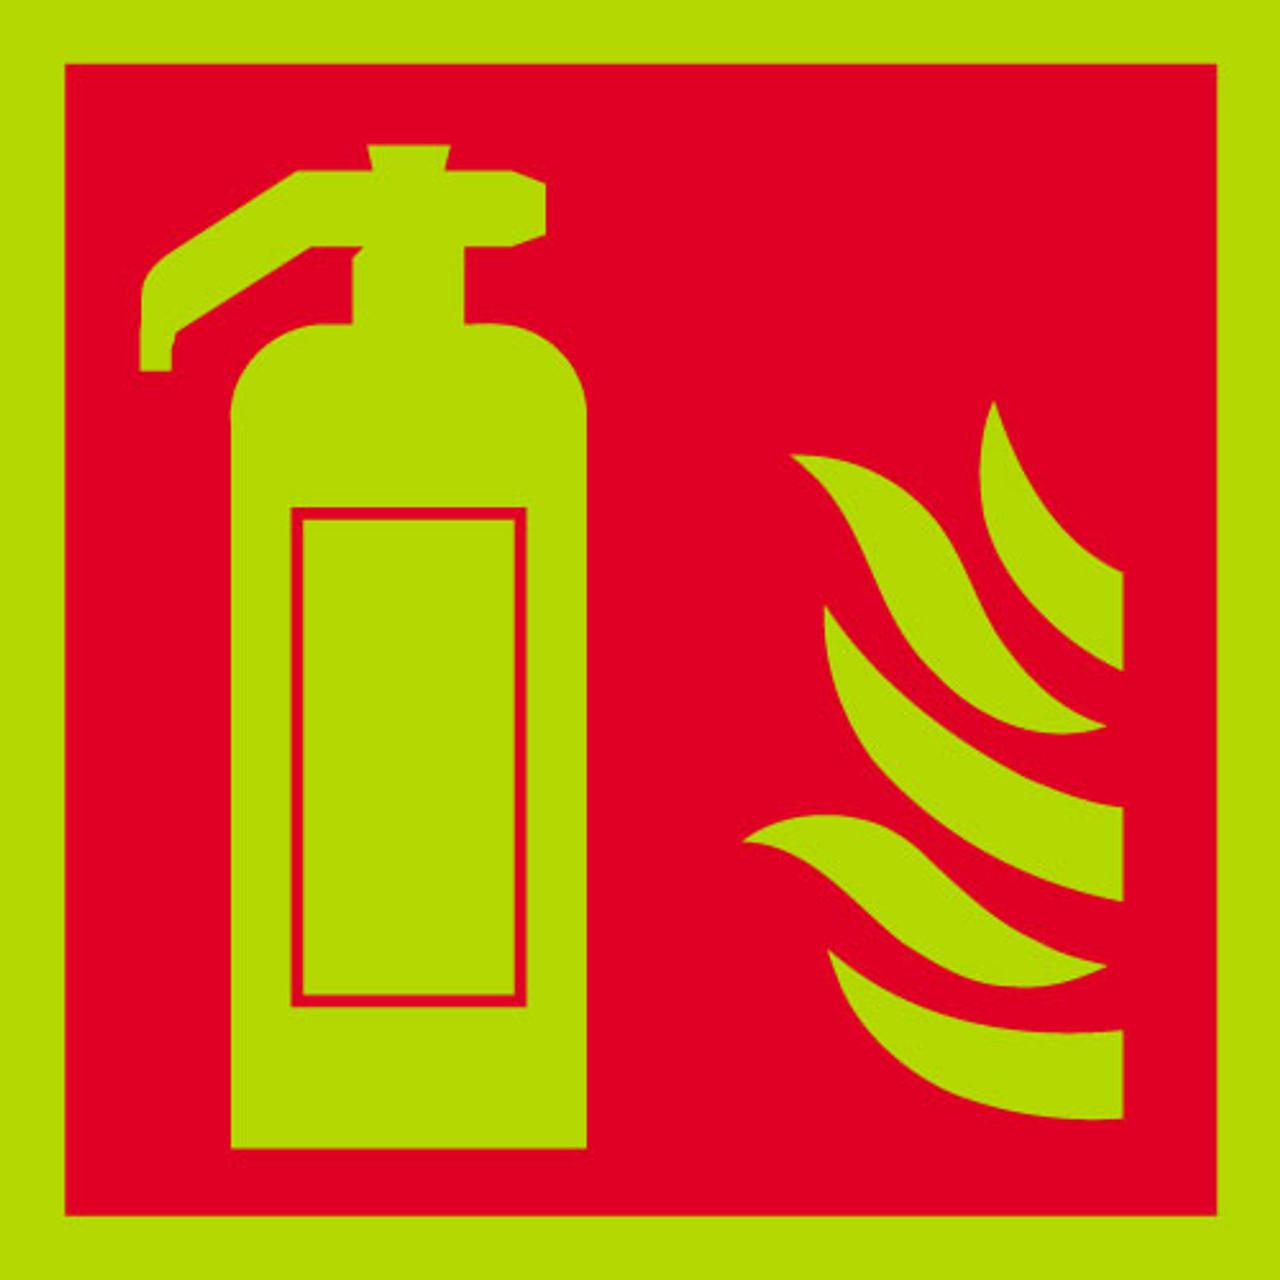 Fire Extinguisher sign, photoluminescent